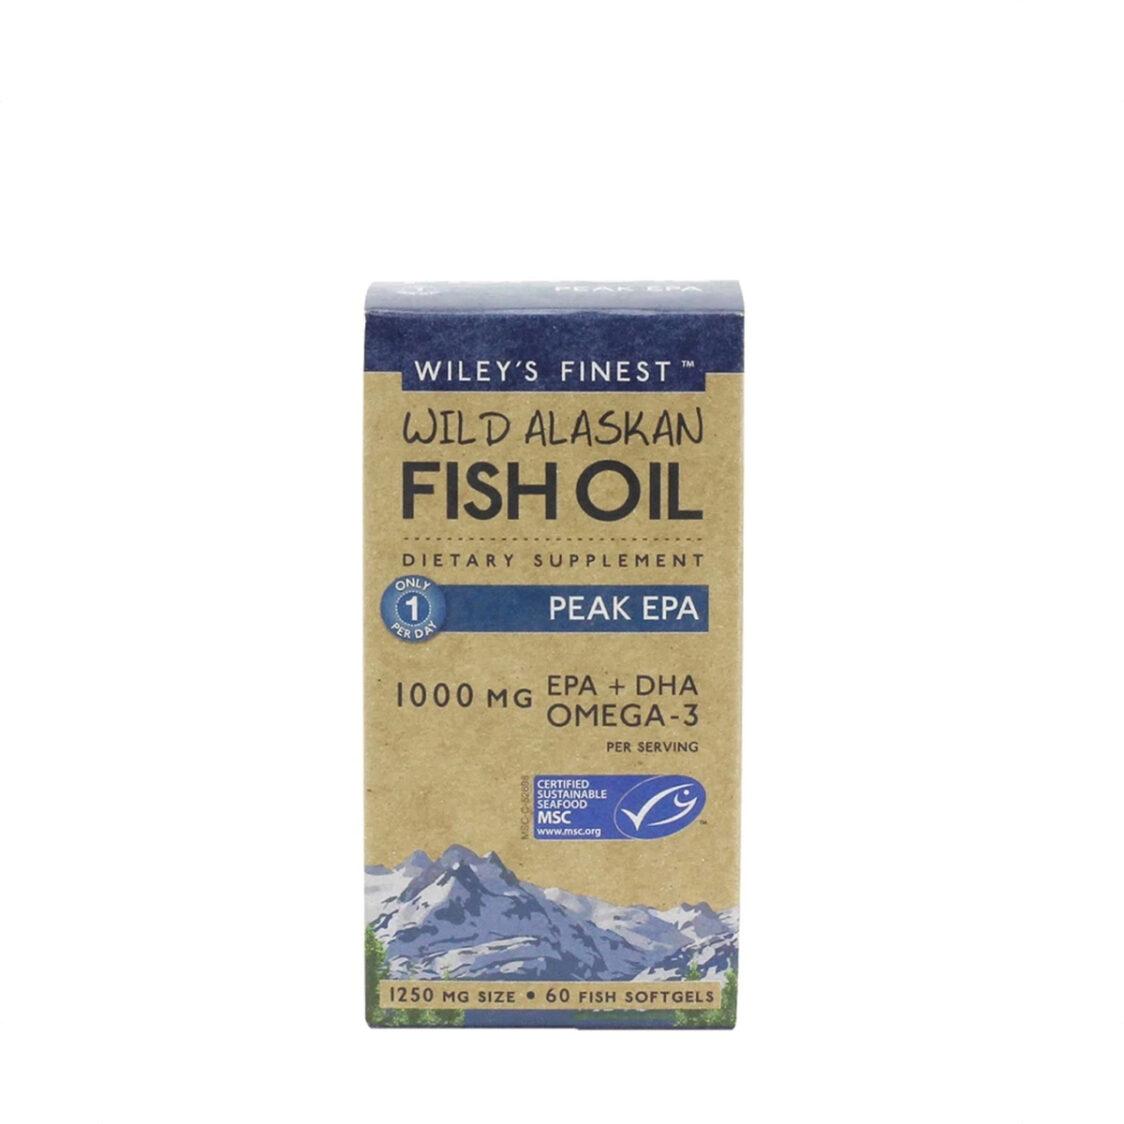 WileyS Finest Wild Alaskan Fish Oil Peak EPA 60 soft gels